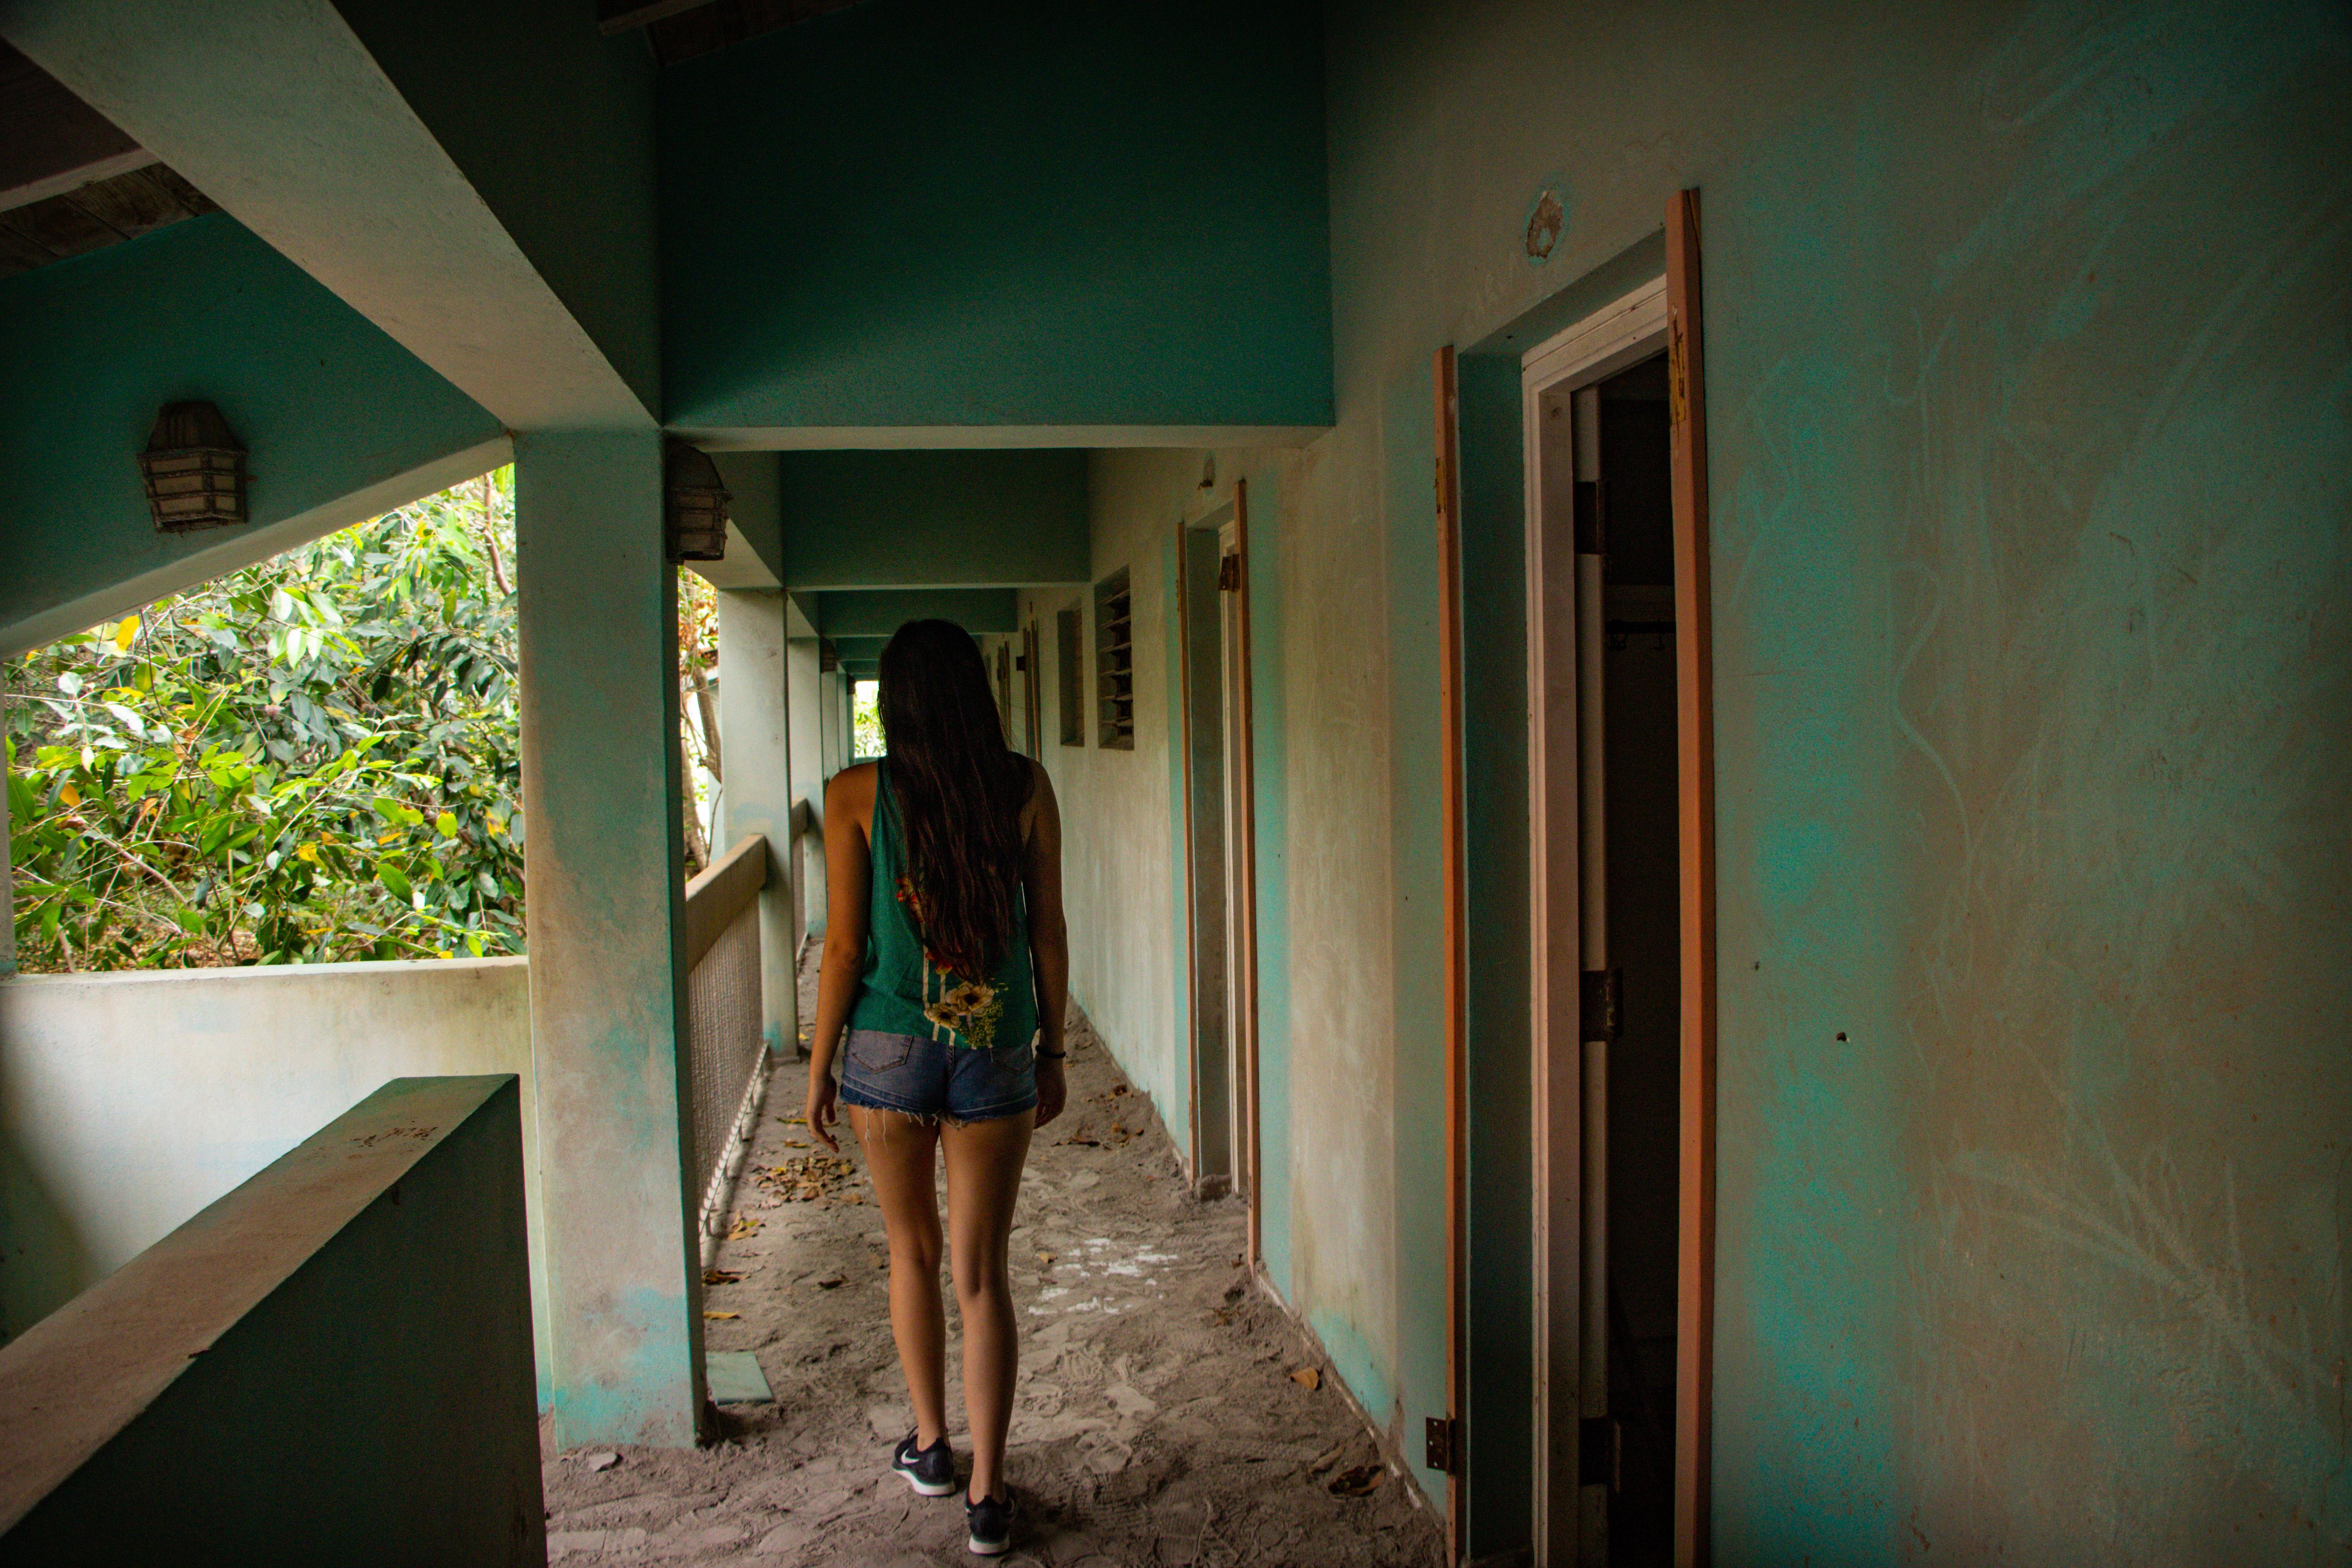 Plymonth montserrat hotel fantasma